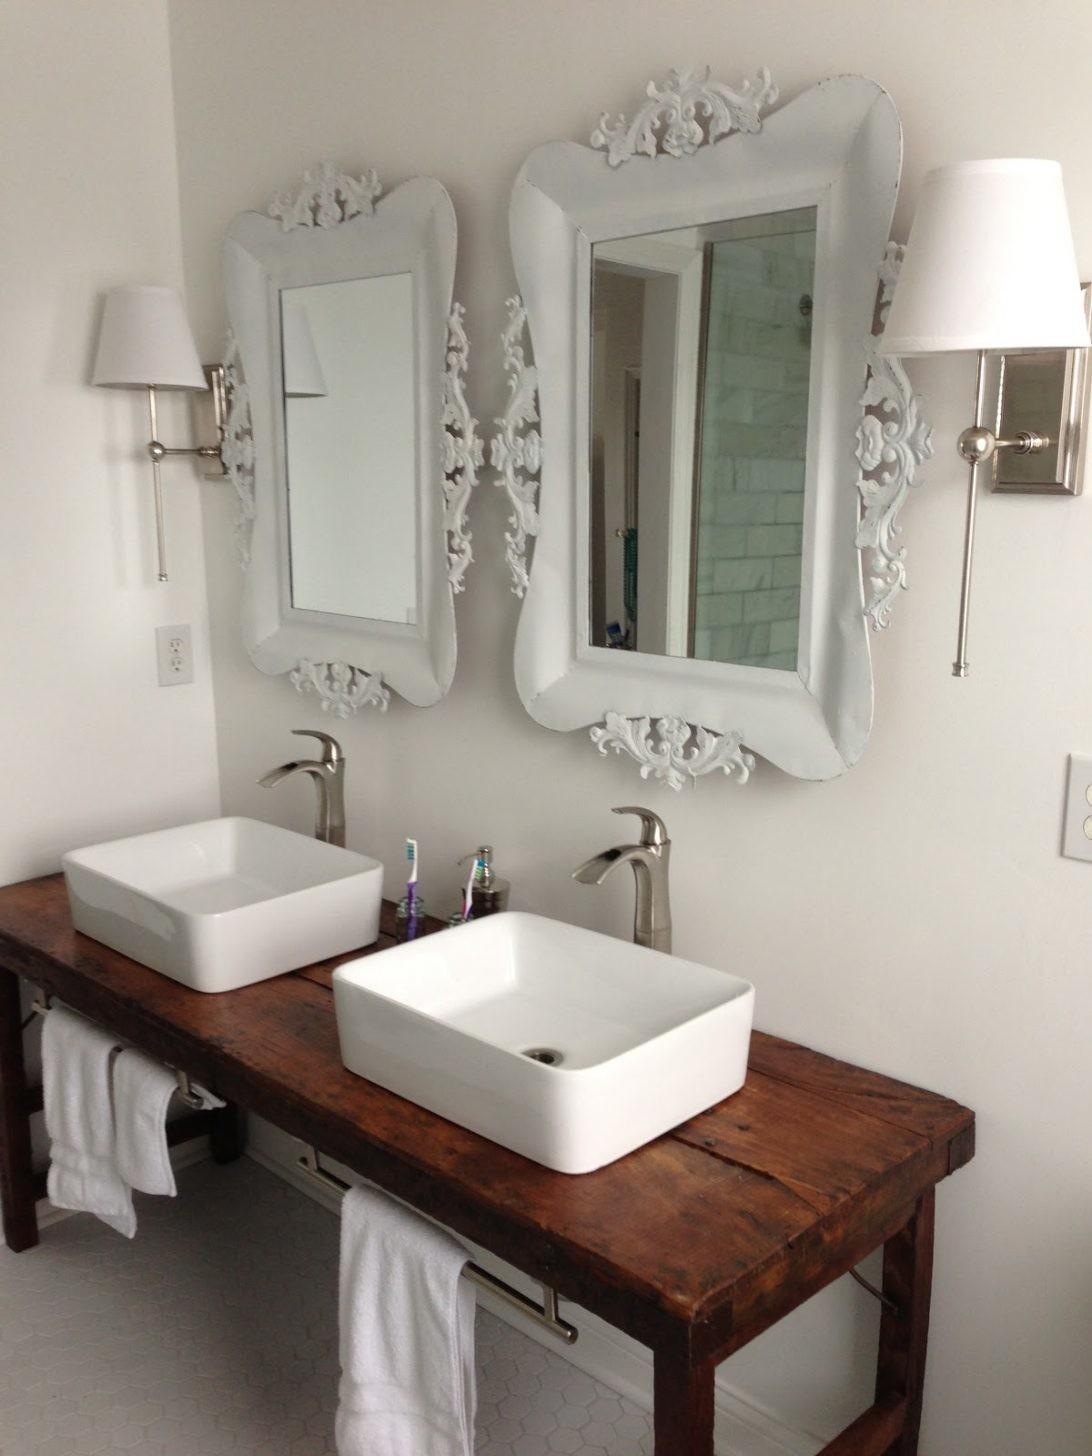 Farmhouse Bathroom Vanity Sink Industrial Decoratorist 227413